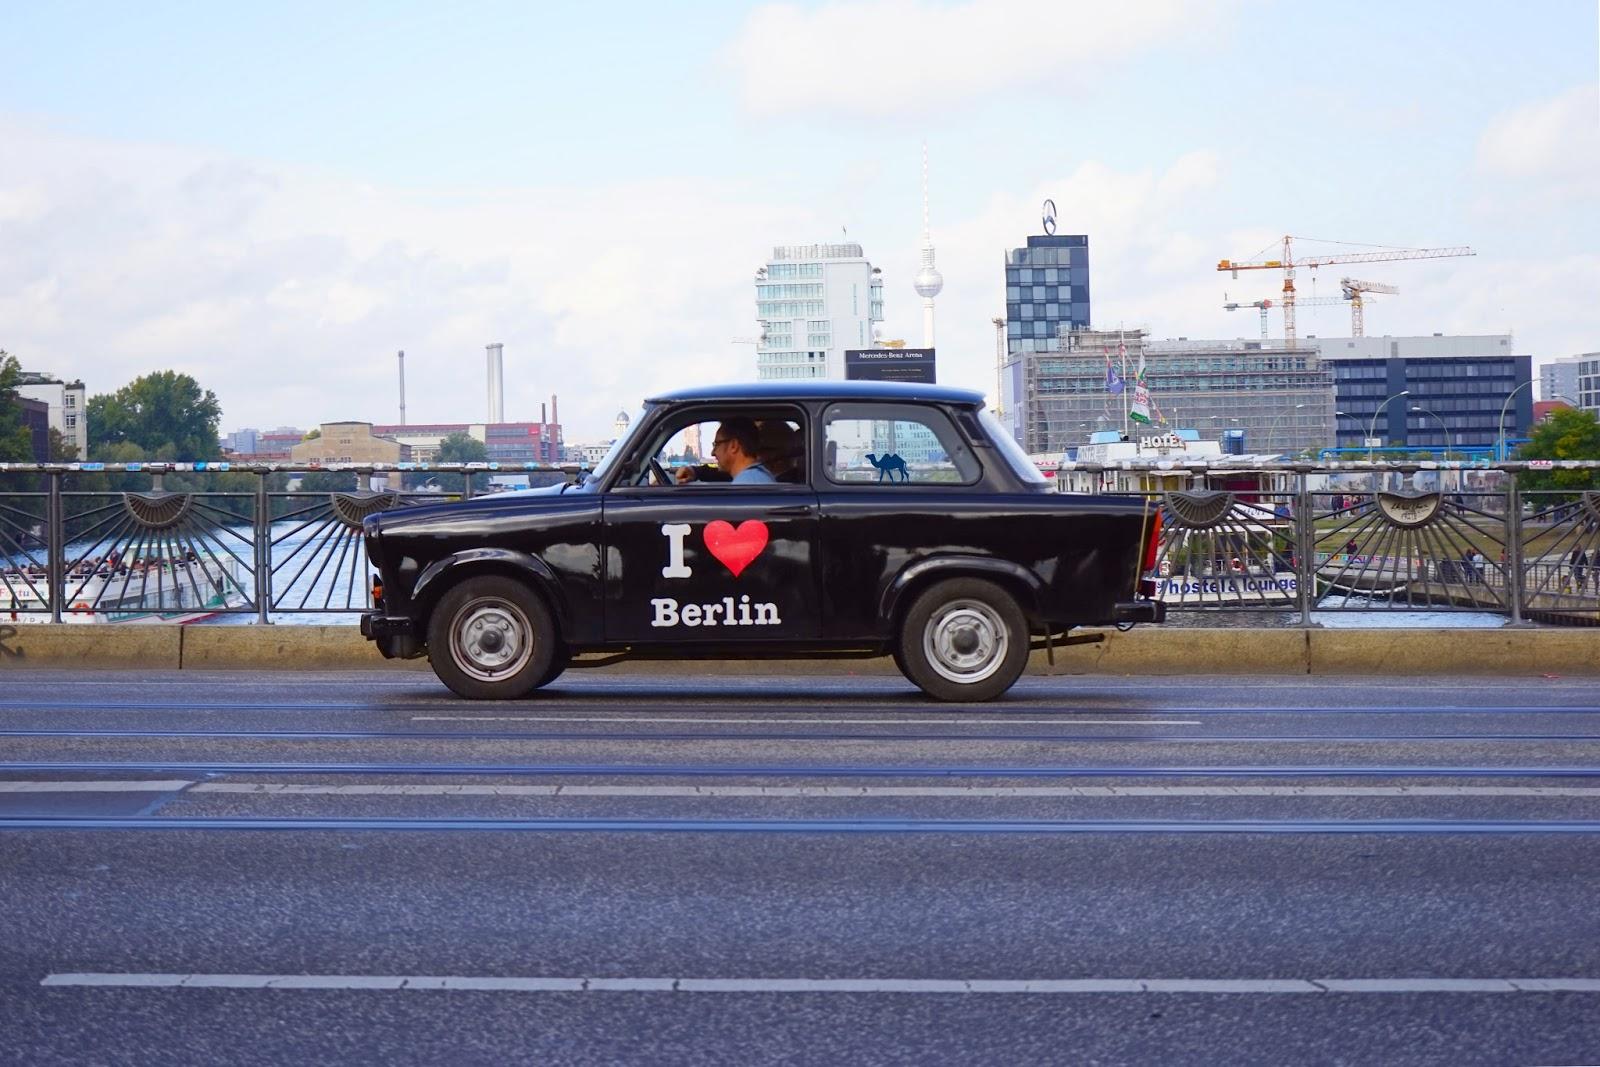 Le Chameau Bleu - I love Berlin